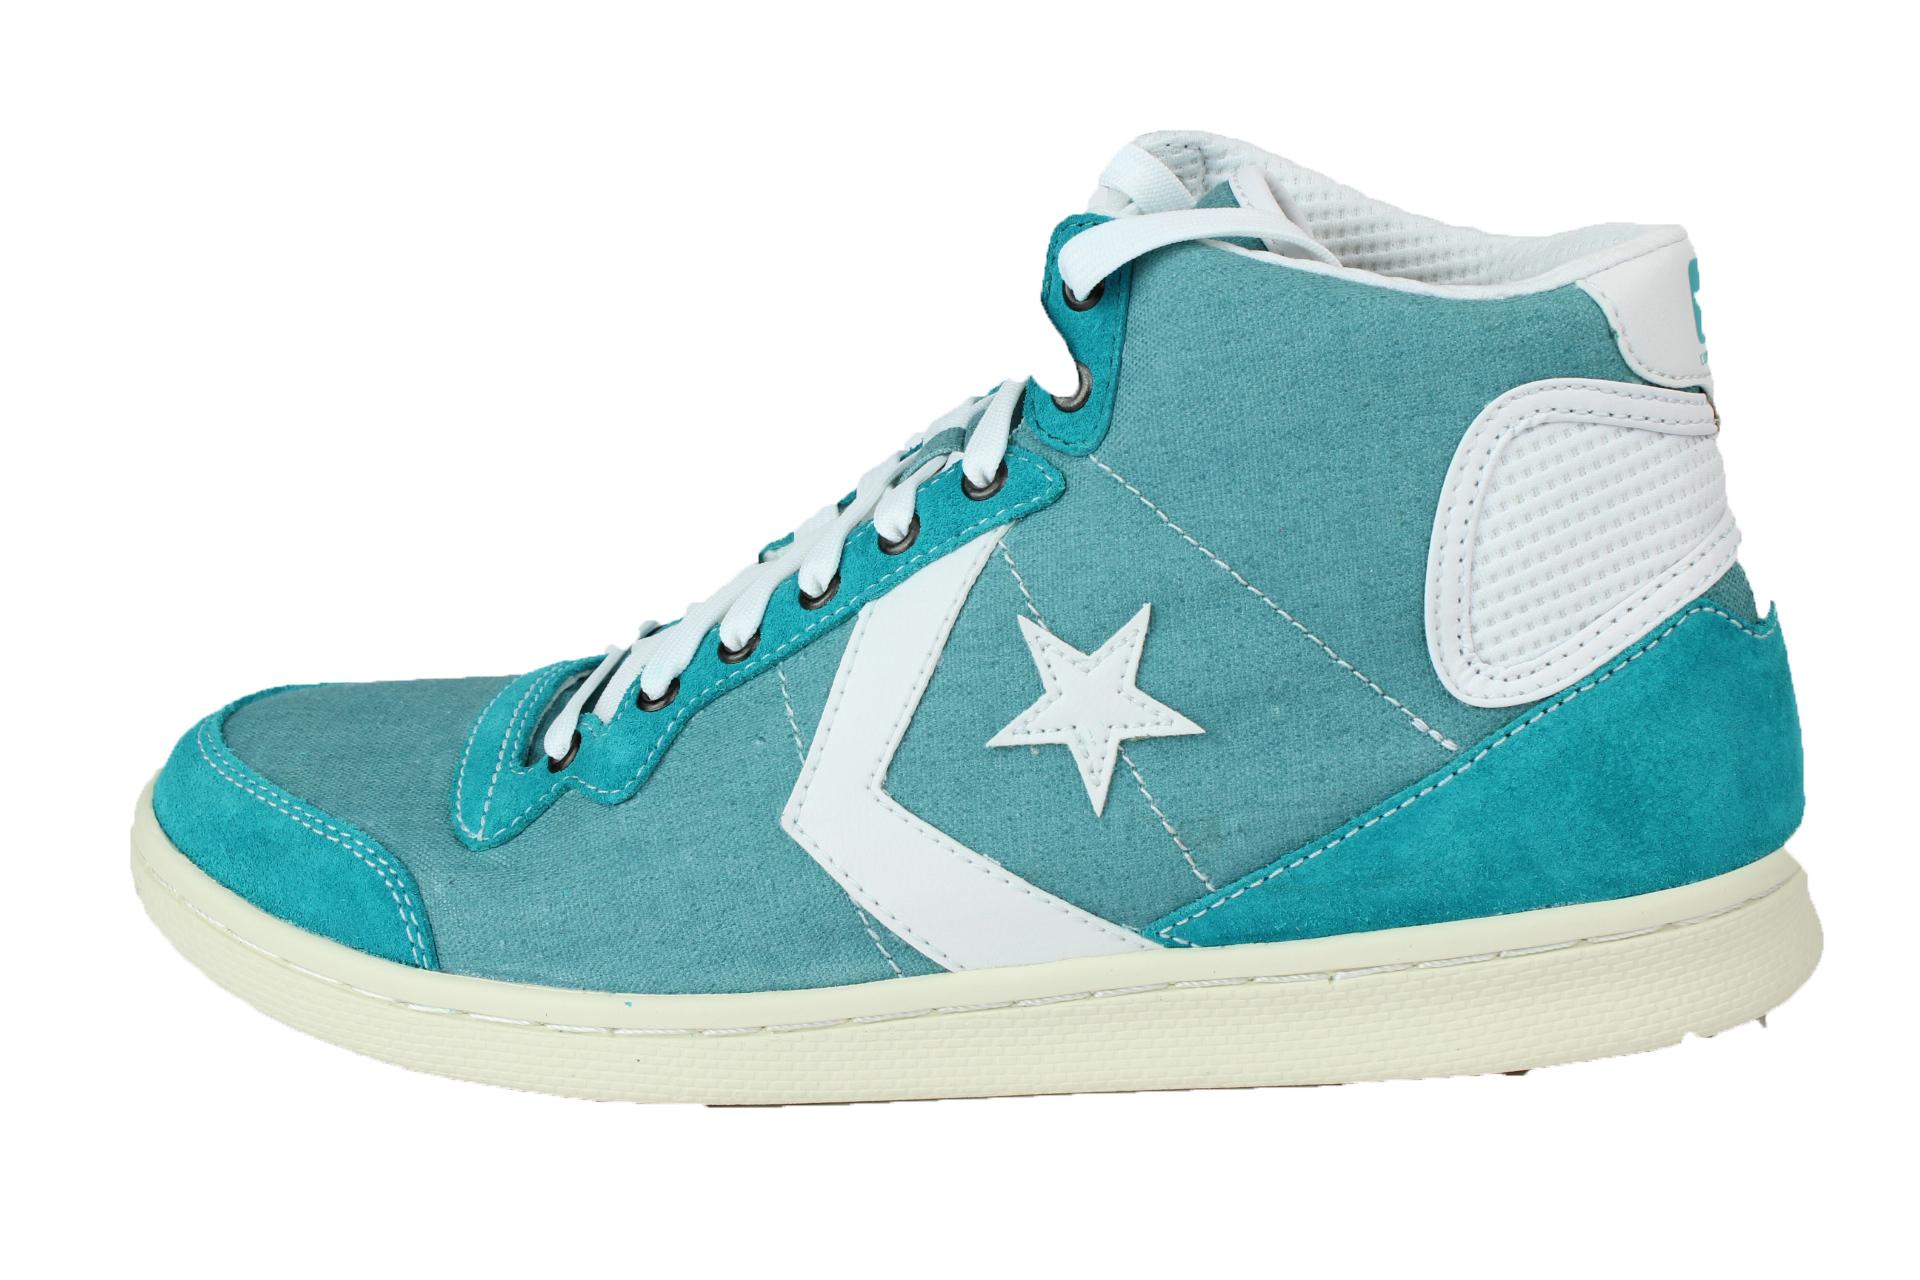 converse fast break mid all star sneaker schuhe gr n gr 42. Black Bedroom Furniture Sets. Home Design Ideas